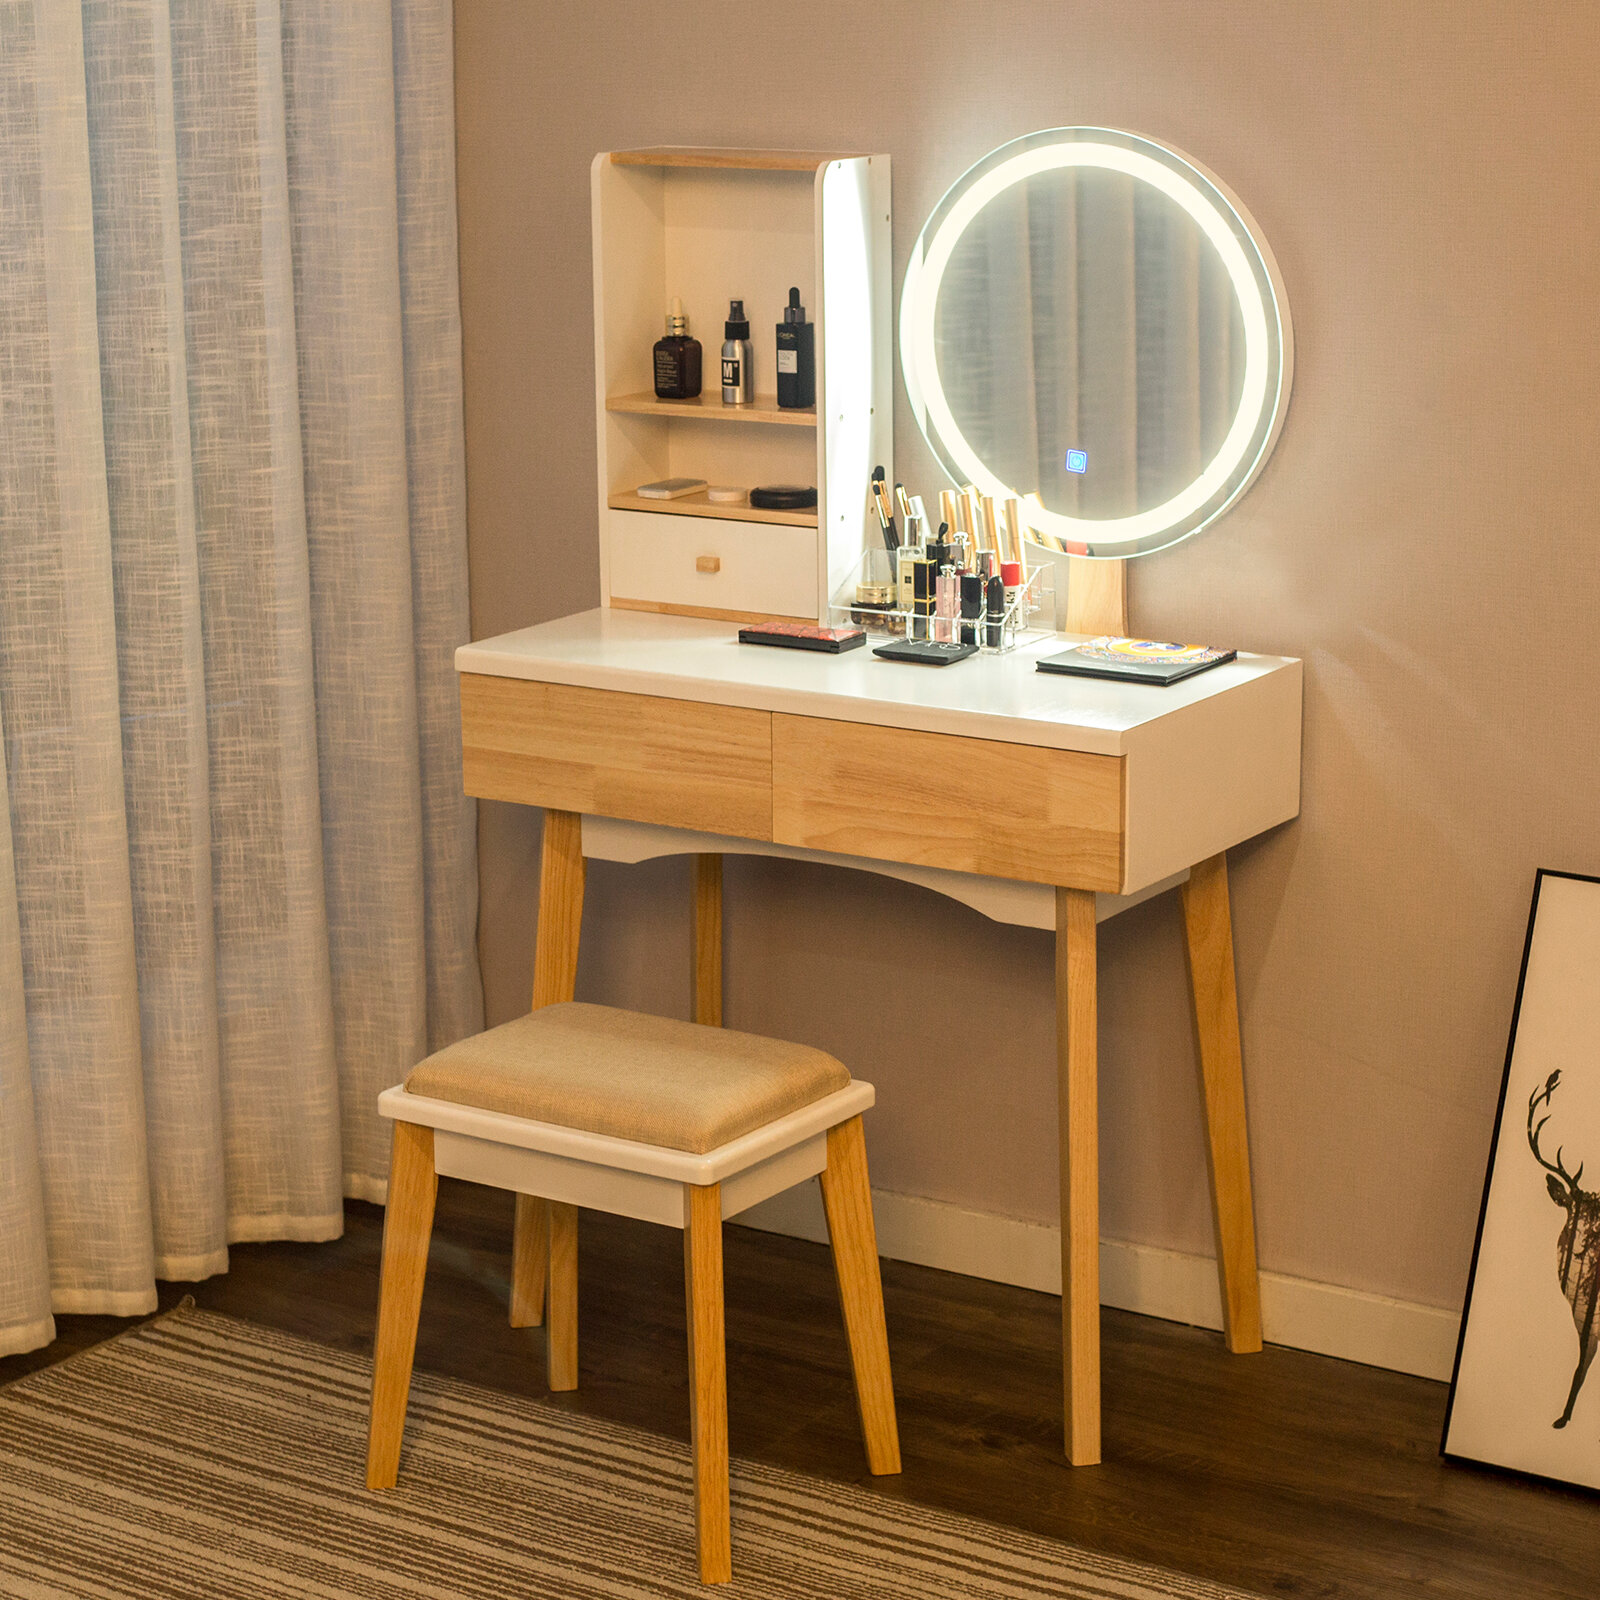 Corrigan Studio Segarra Vanity Set With Stool And Mirror Reviews Wayfair